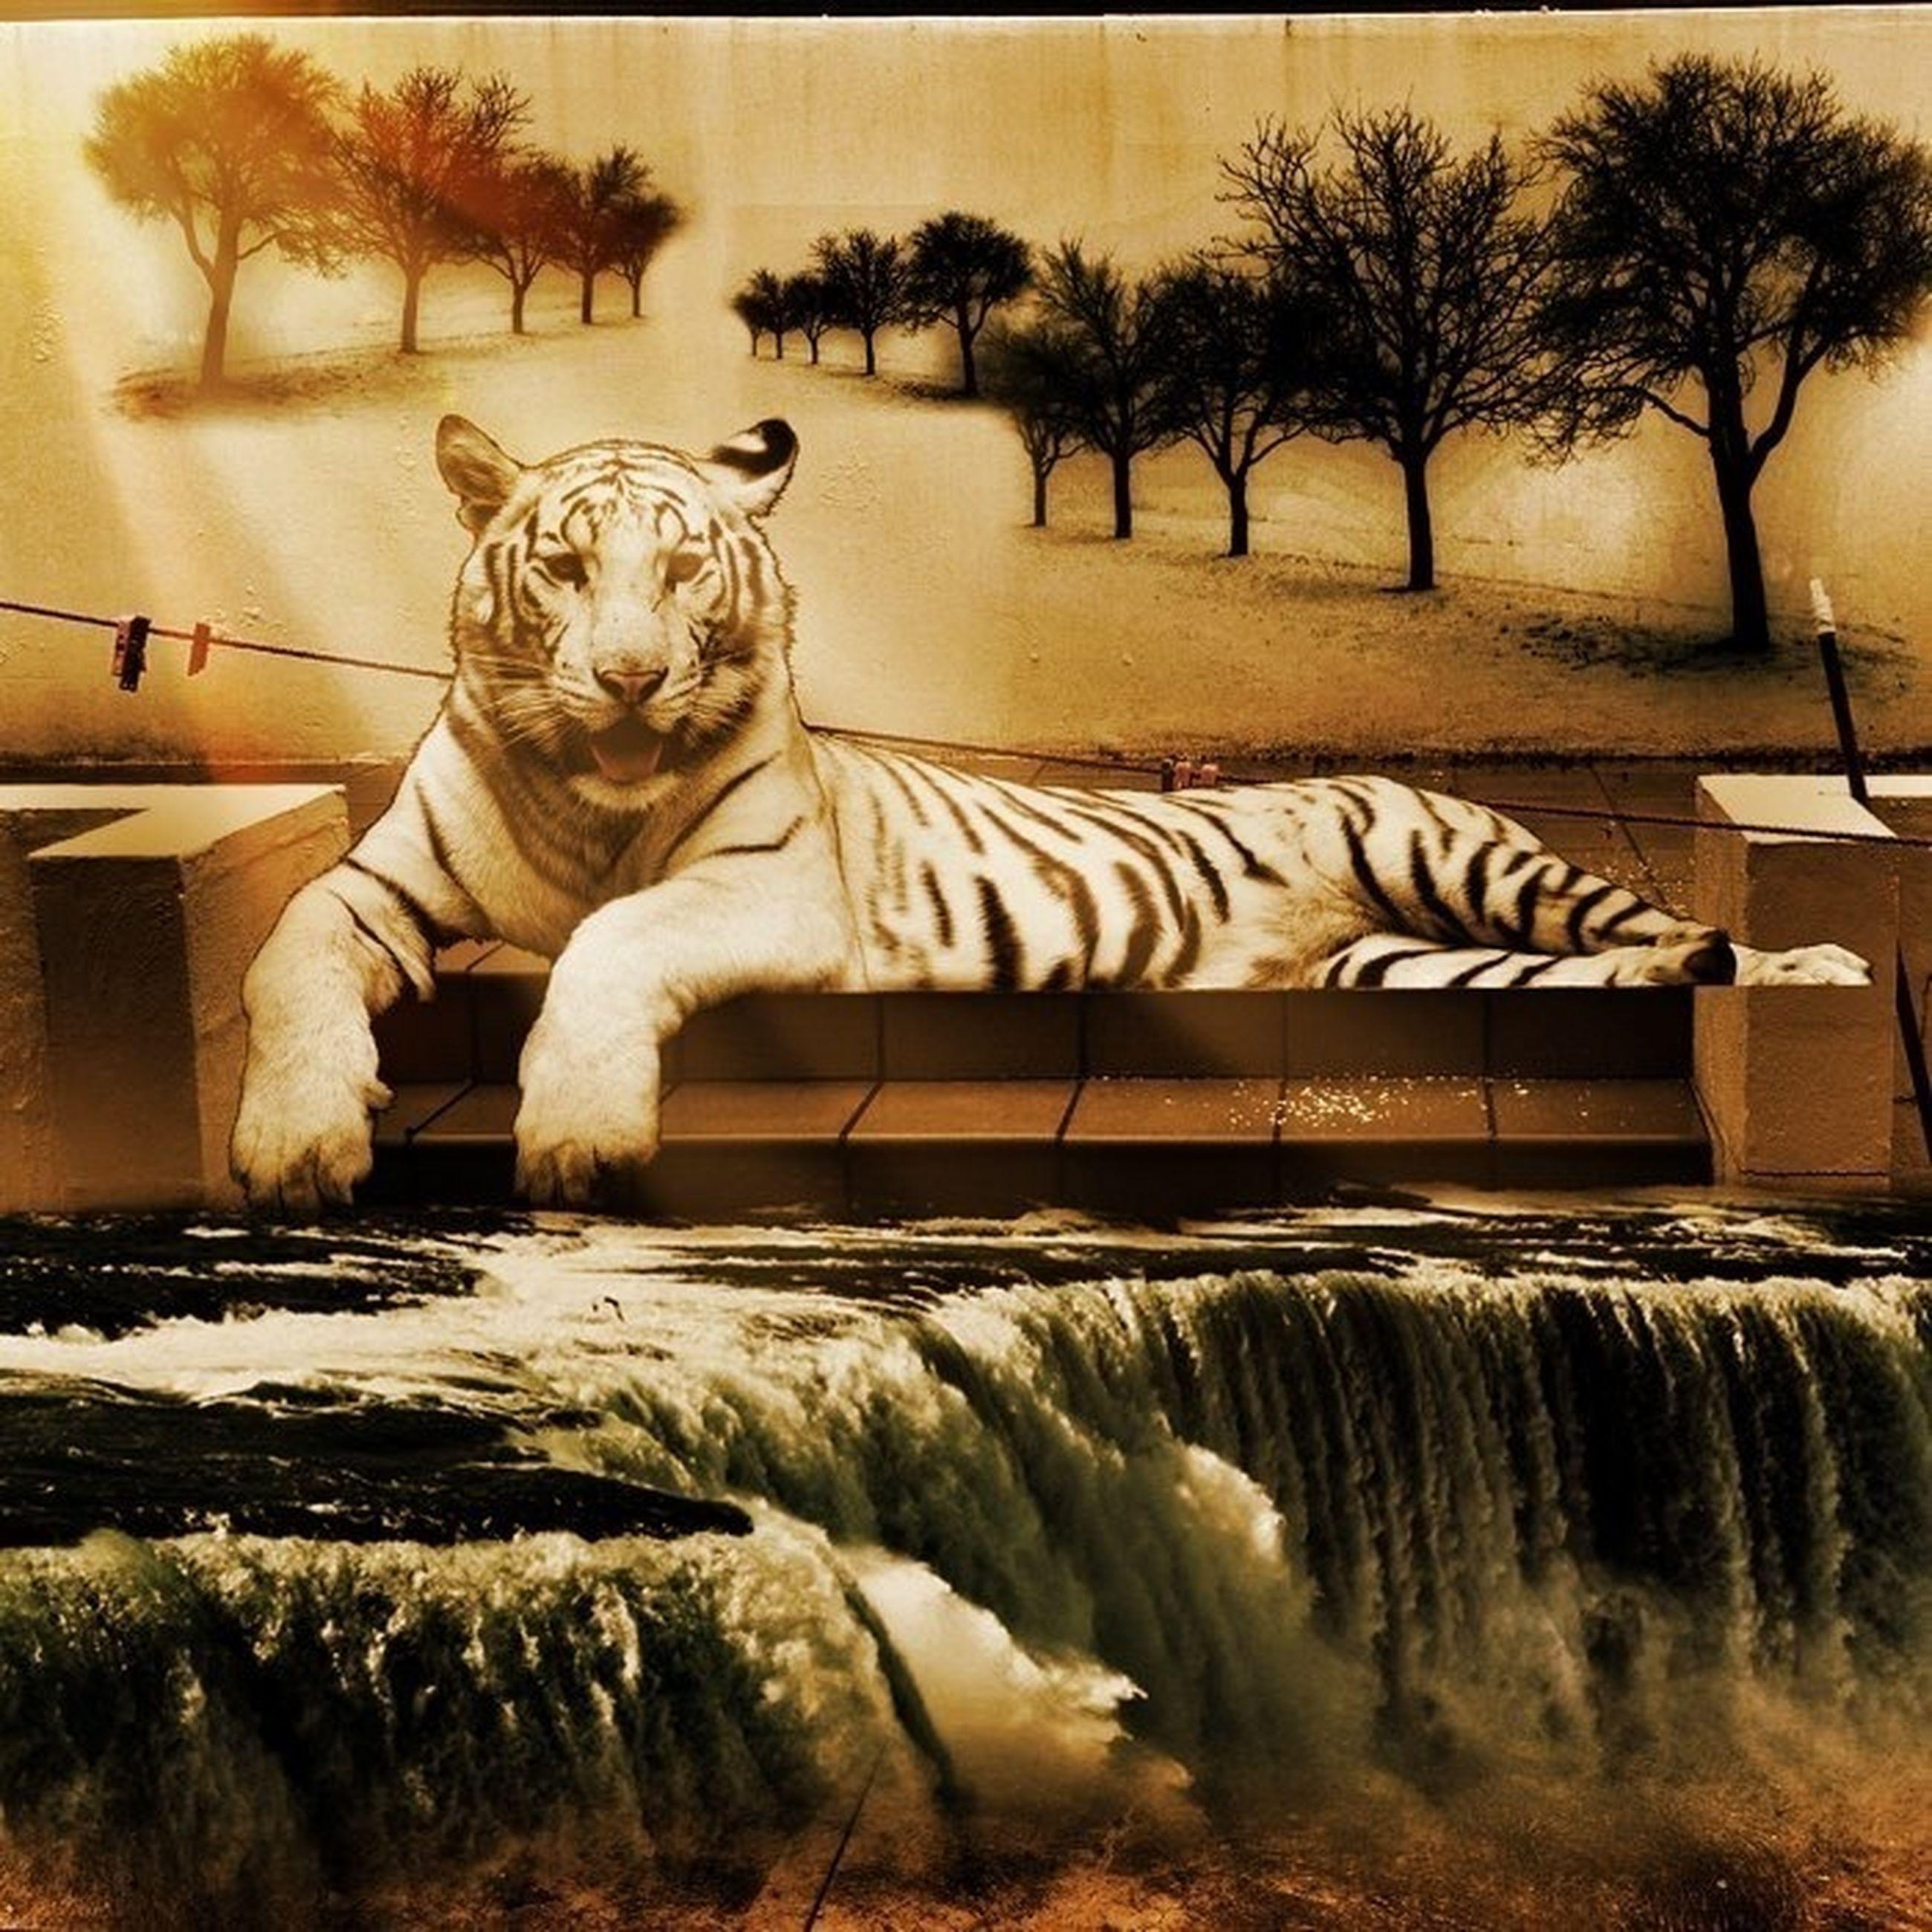 animal themes, tree, art and craft, art, mammal, safari animals, creativity, wildlife, zoo, animals in the wild, sculpture, zebra, animal representation, herbivorous, horse, palm tree, built structure, outdoors, two animals, standing